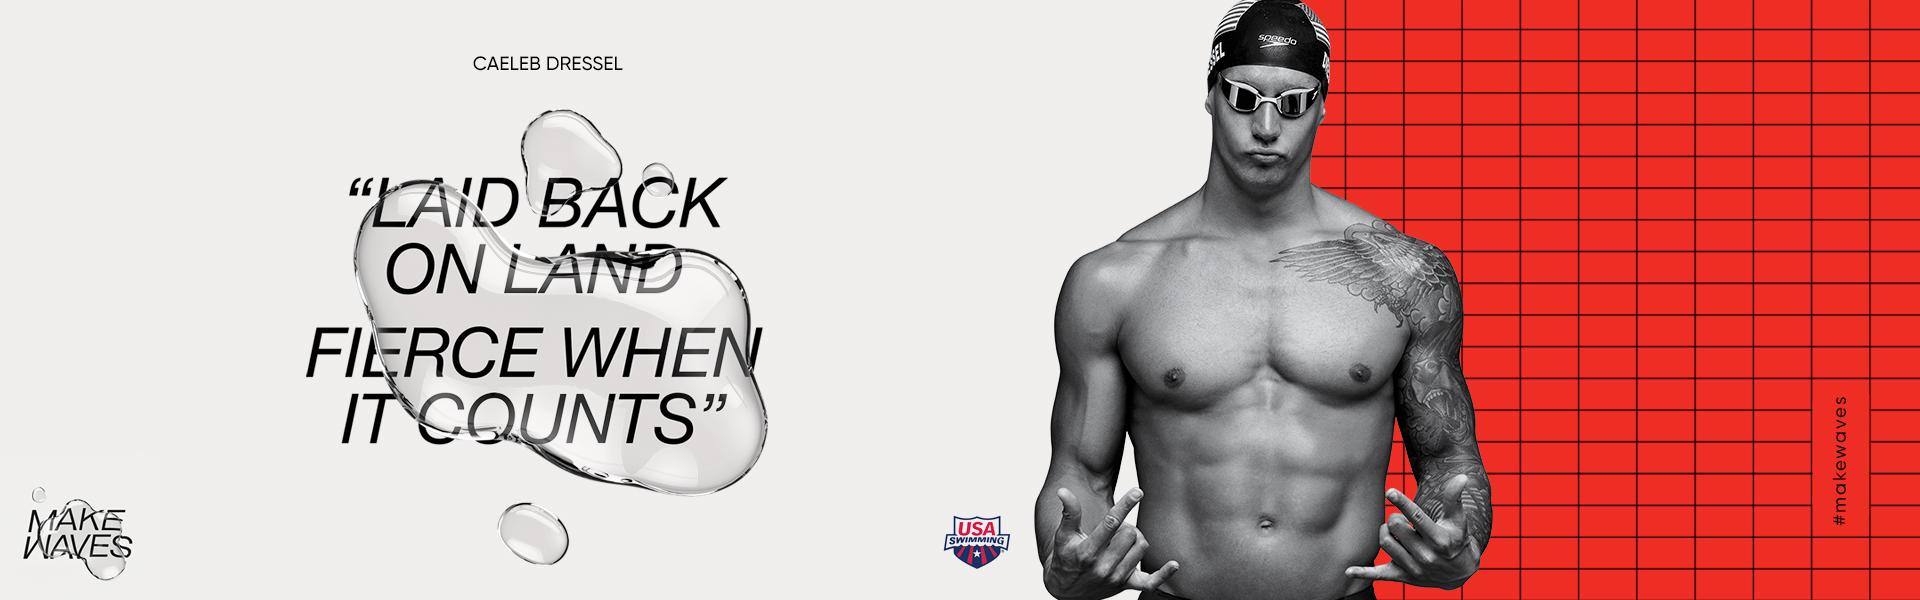 Swimwear Collection. Caeleb Dressel: Laid back on land. Fierce when it counts. USA Swimming. #MakeWaves